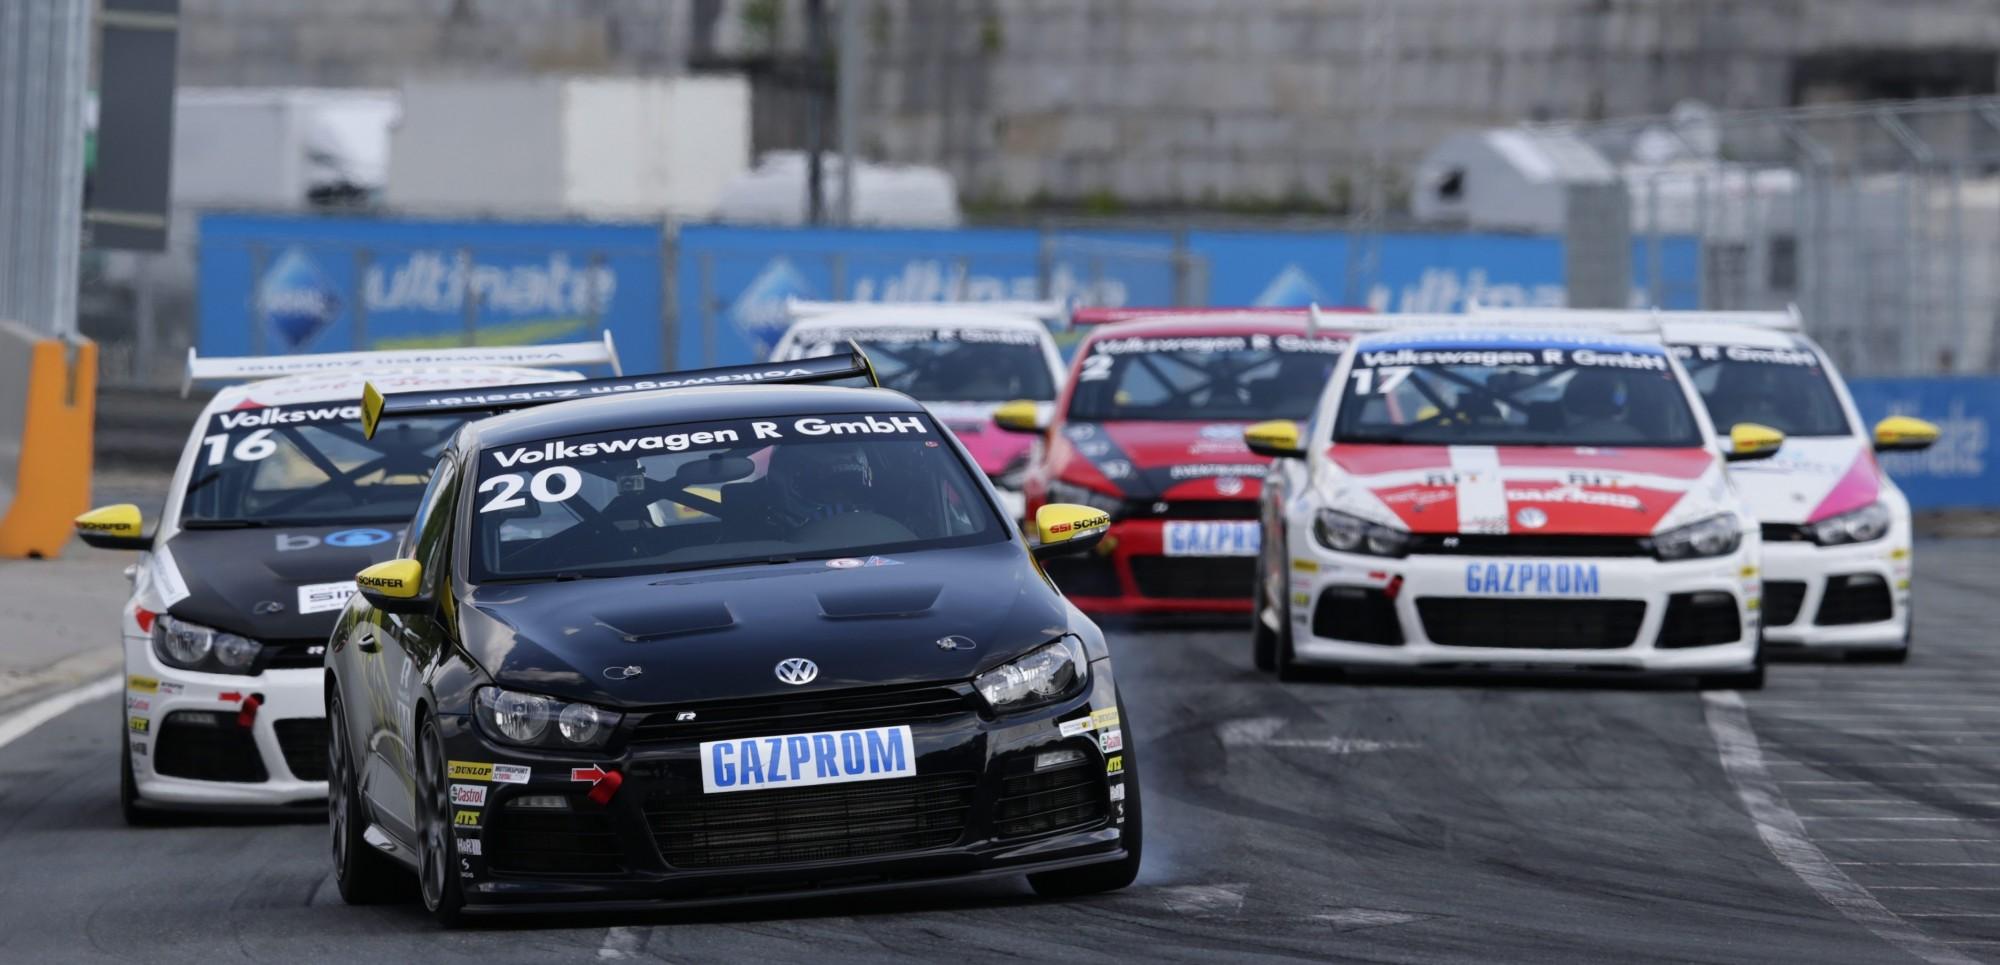 Norisring Race: Van der Linde Steals the Show – Bad luck for Larini.